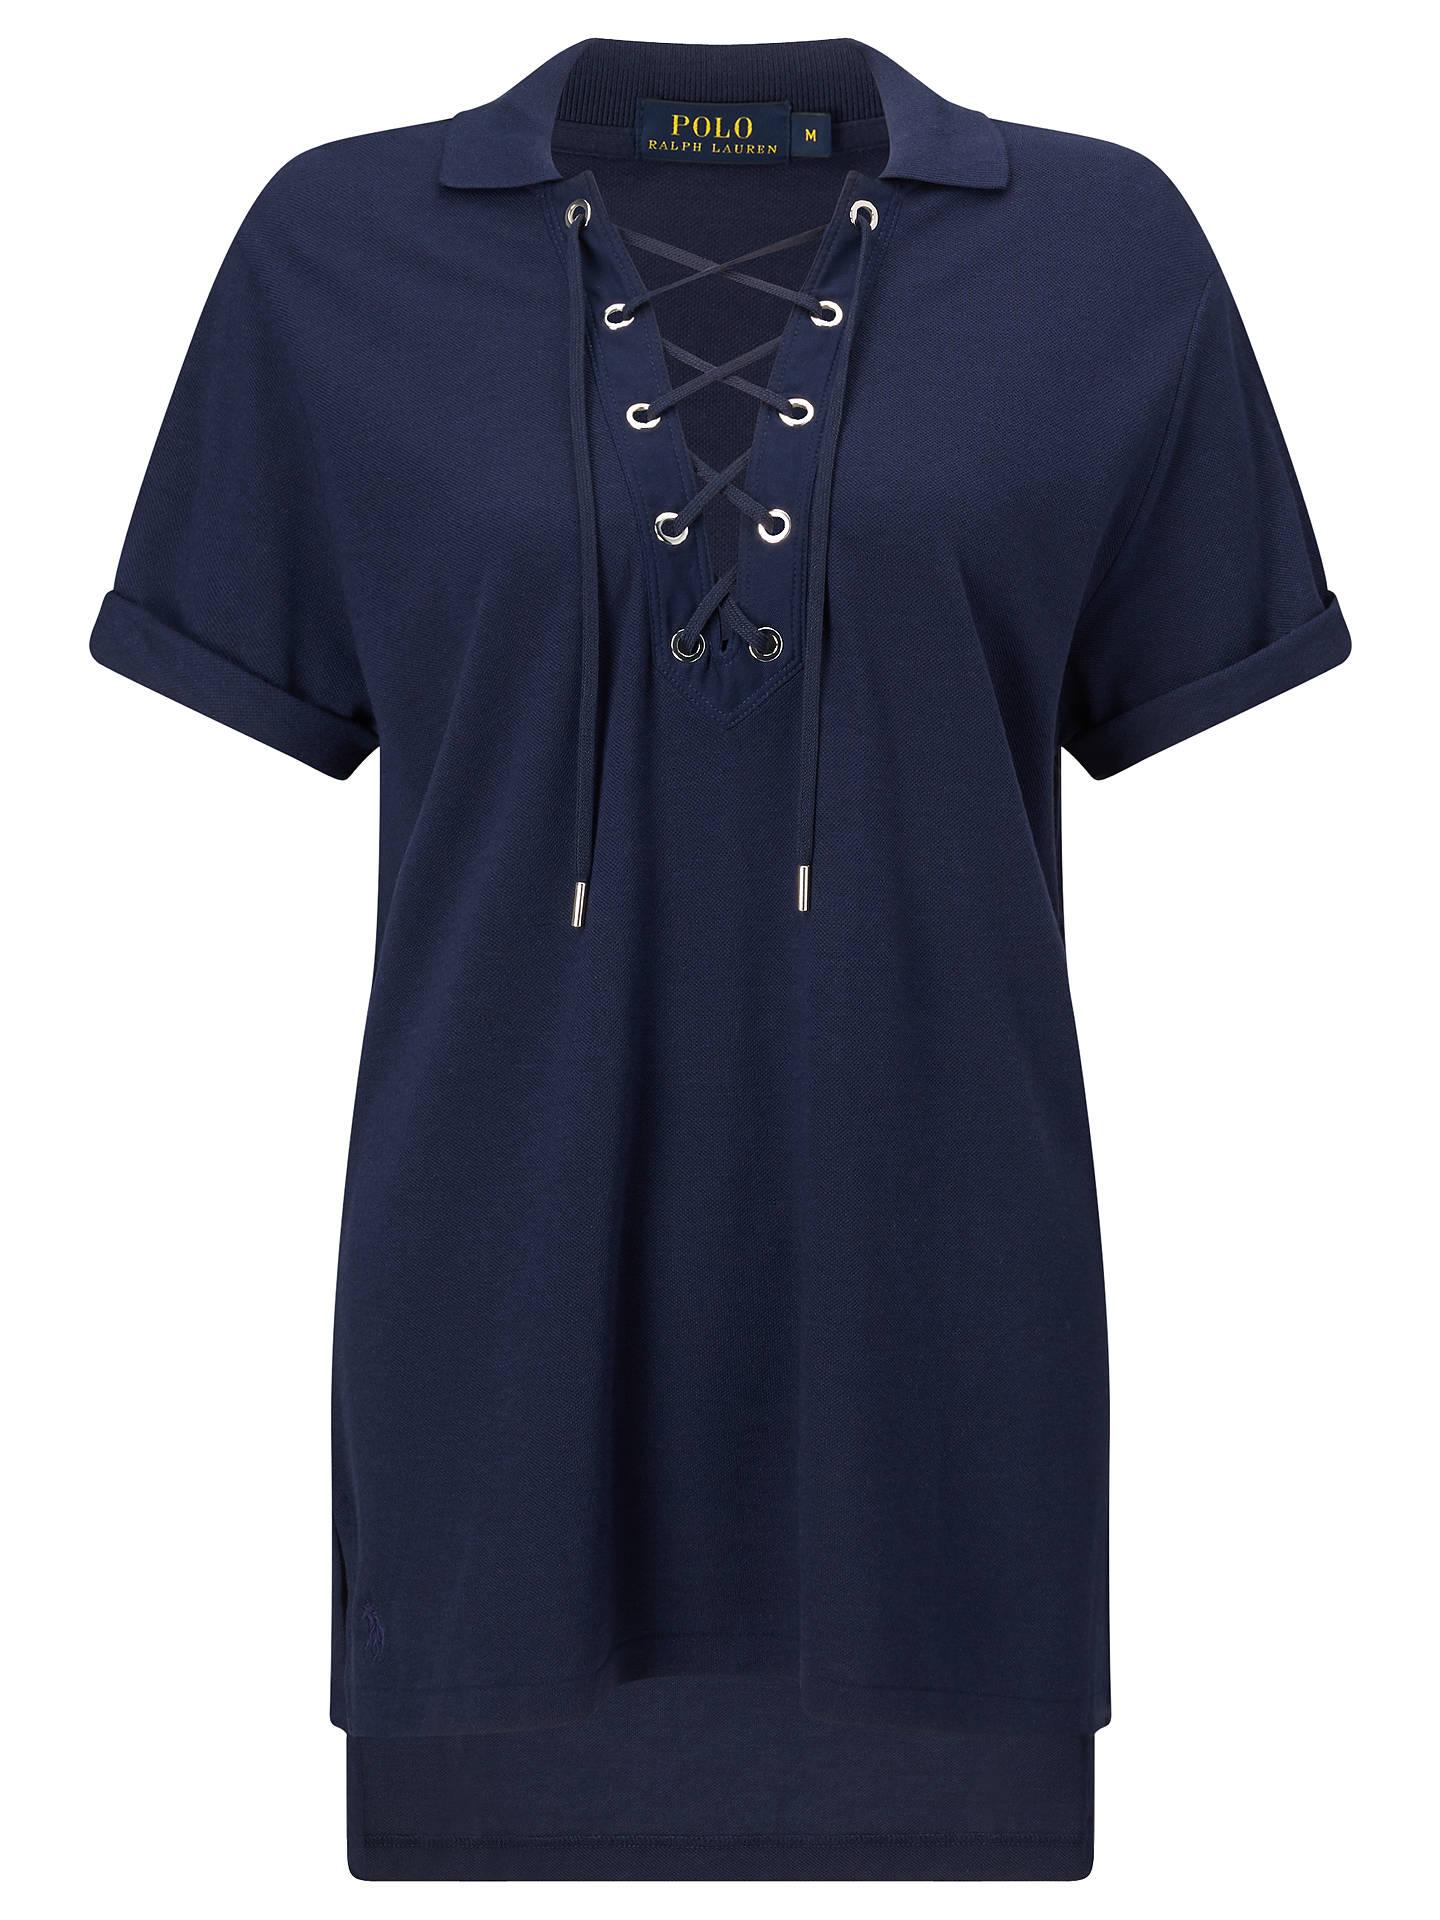 BuyPolo Ralph Lauren Lace-Up Mesh Boyfriend Polo Shirt aef8a42f94c